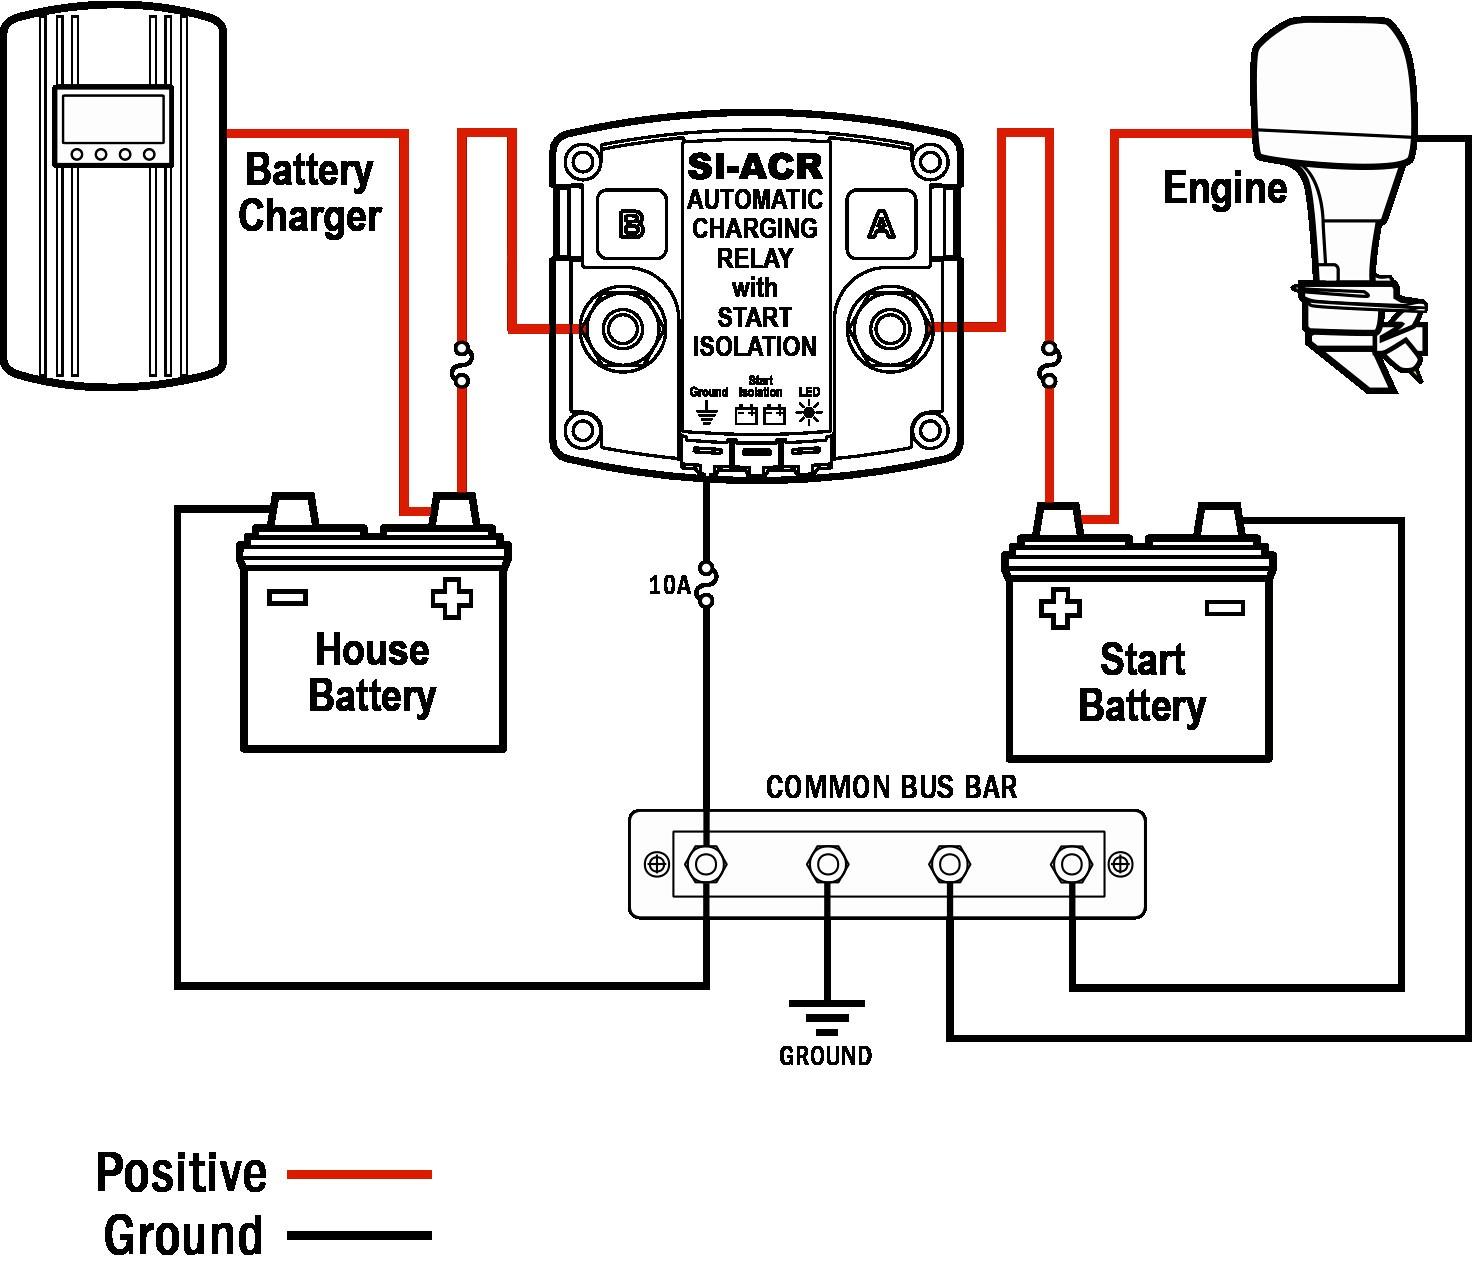 Marine Battery Switch Wiring Diagram WIRING DIAGRAM Prepossessing